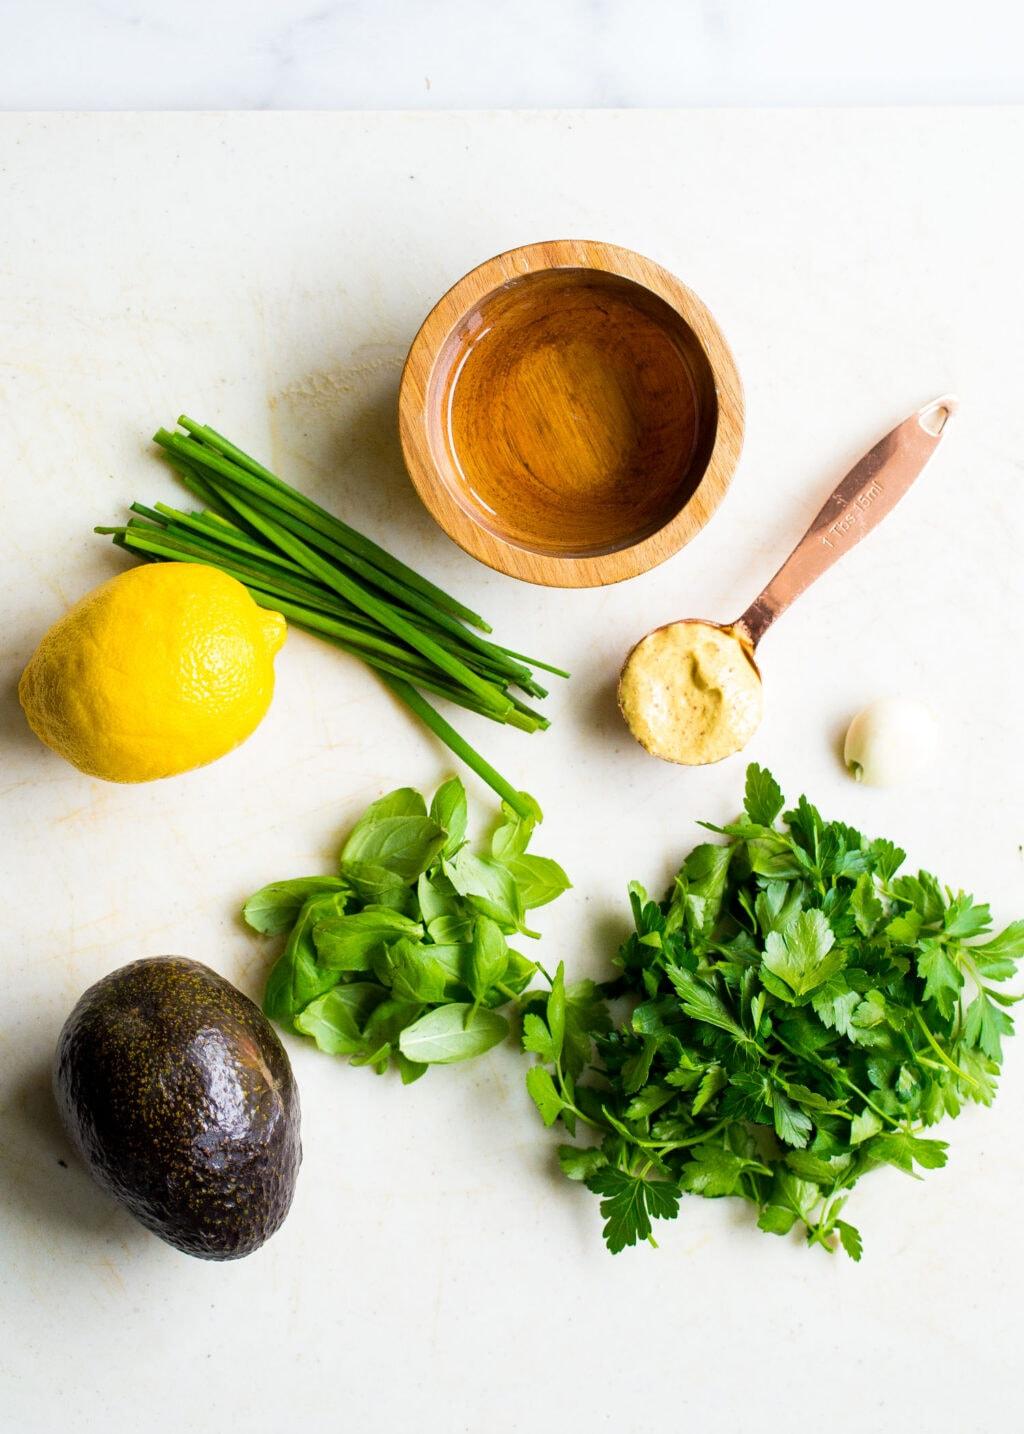 Fresh herbs, lemon, avocado, and dijon mustard on a white background.